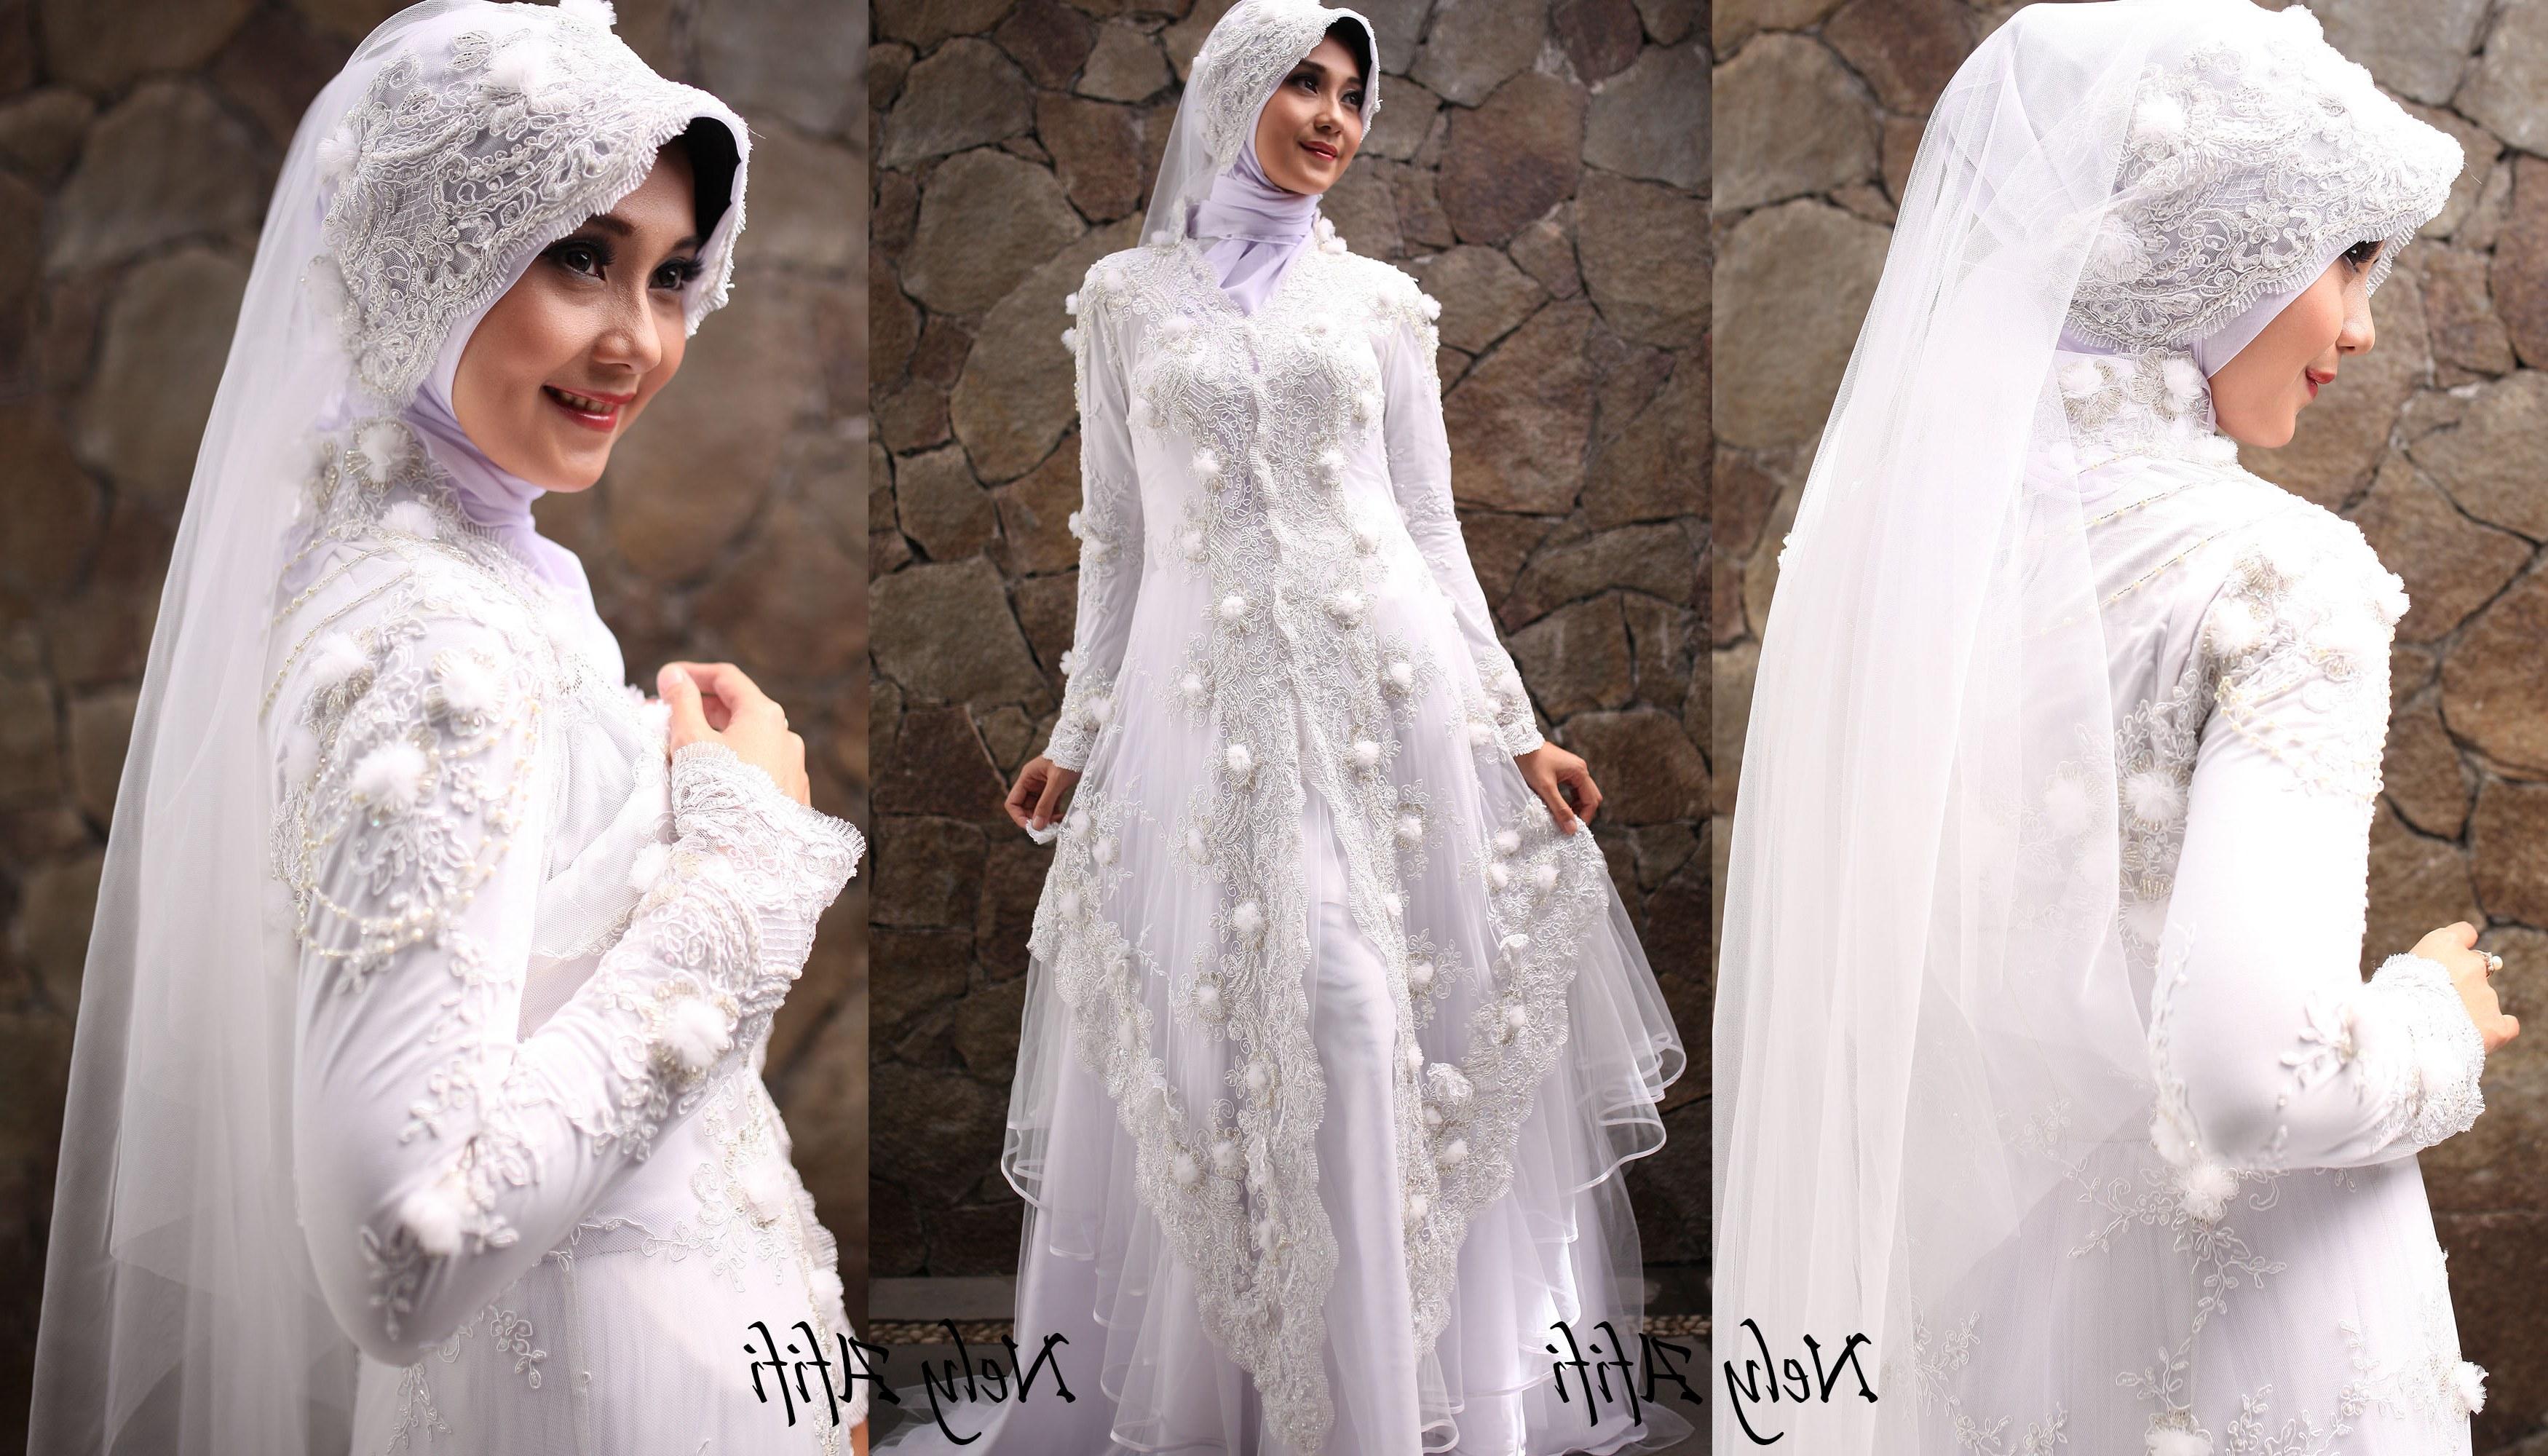 Model Baju Pengantin Muslimah Syar'i Kebaya Fmdf Baju Pengantin Adat Bali Modern